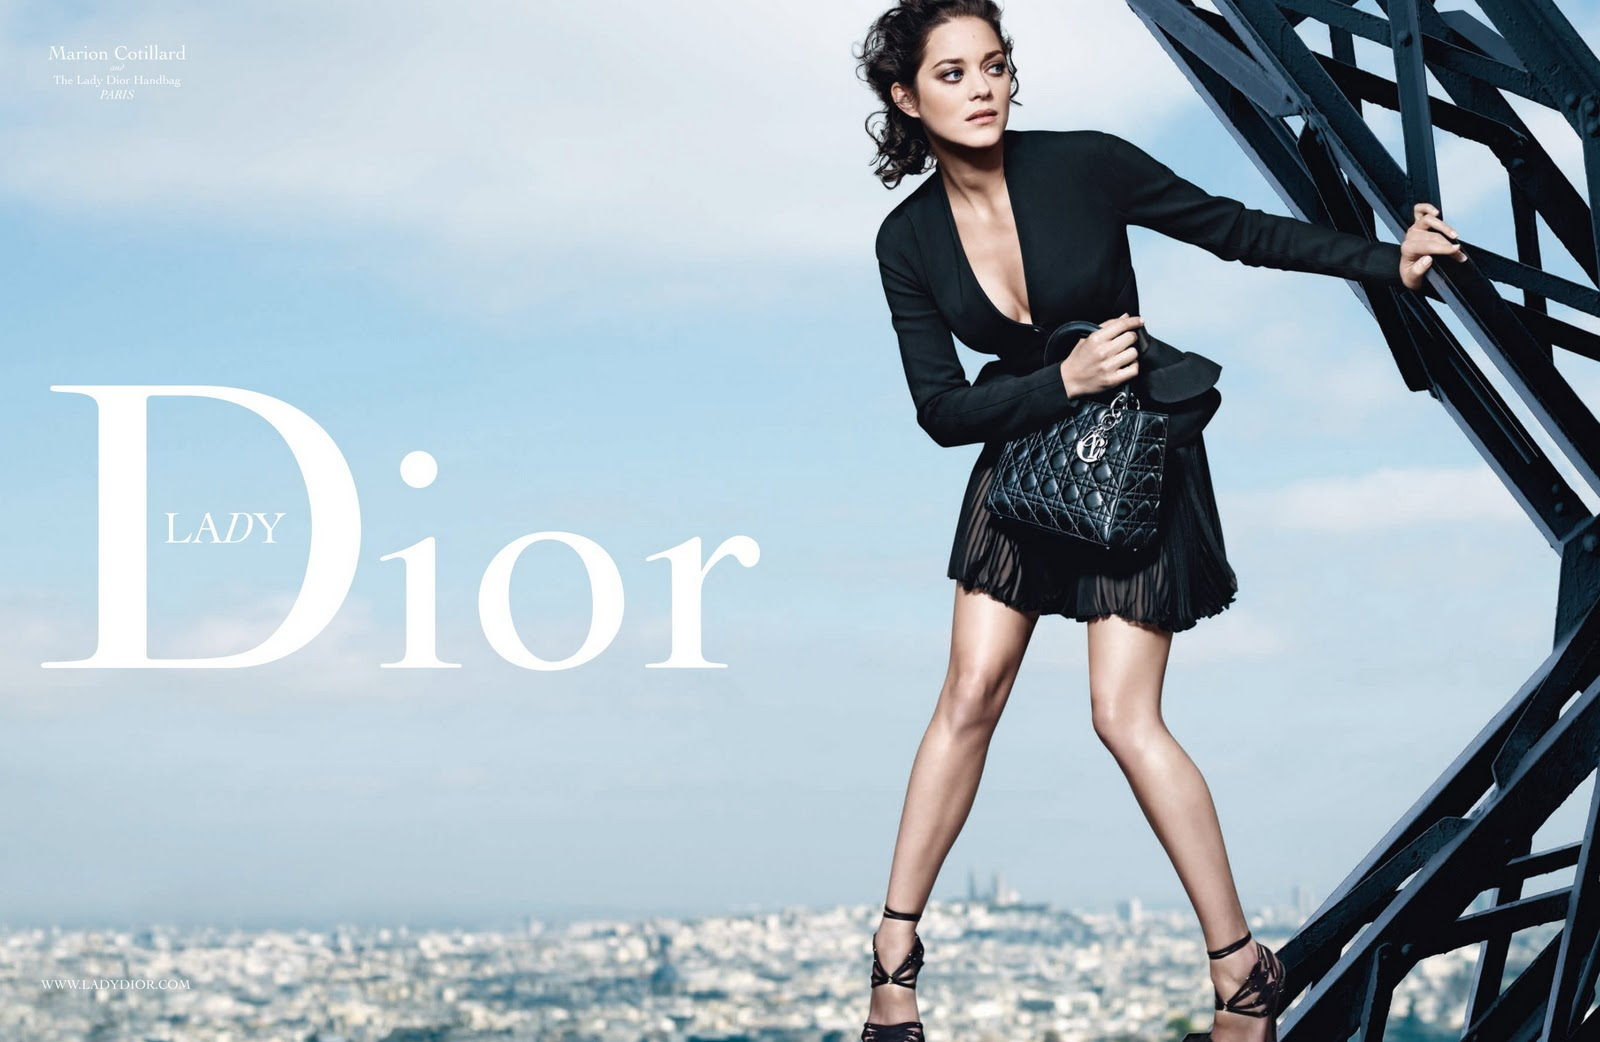 http://4.bp.blogspot.com/_m5u9mNBBNAc/TMEk-4QLTwI/AAAAAAAAAow/hQkw5xG4-Ls/s1600/christian+dior+2009+advert+marion+cotillard+noir+lady+dior+paris.jpg